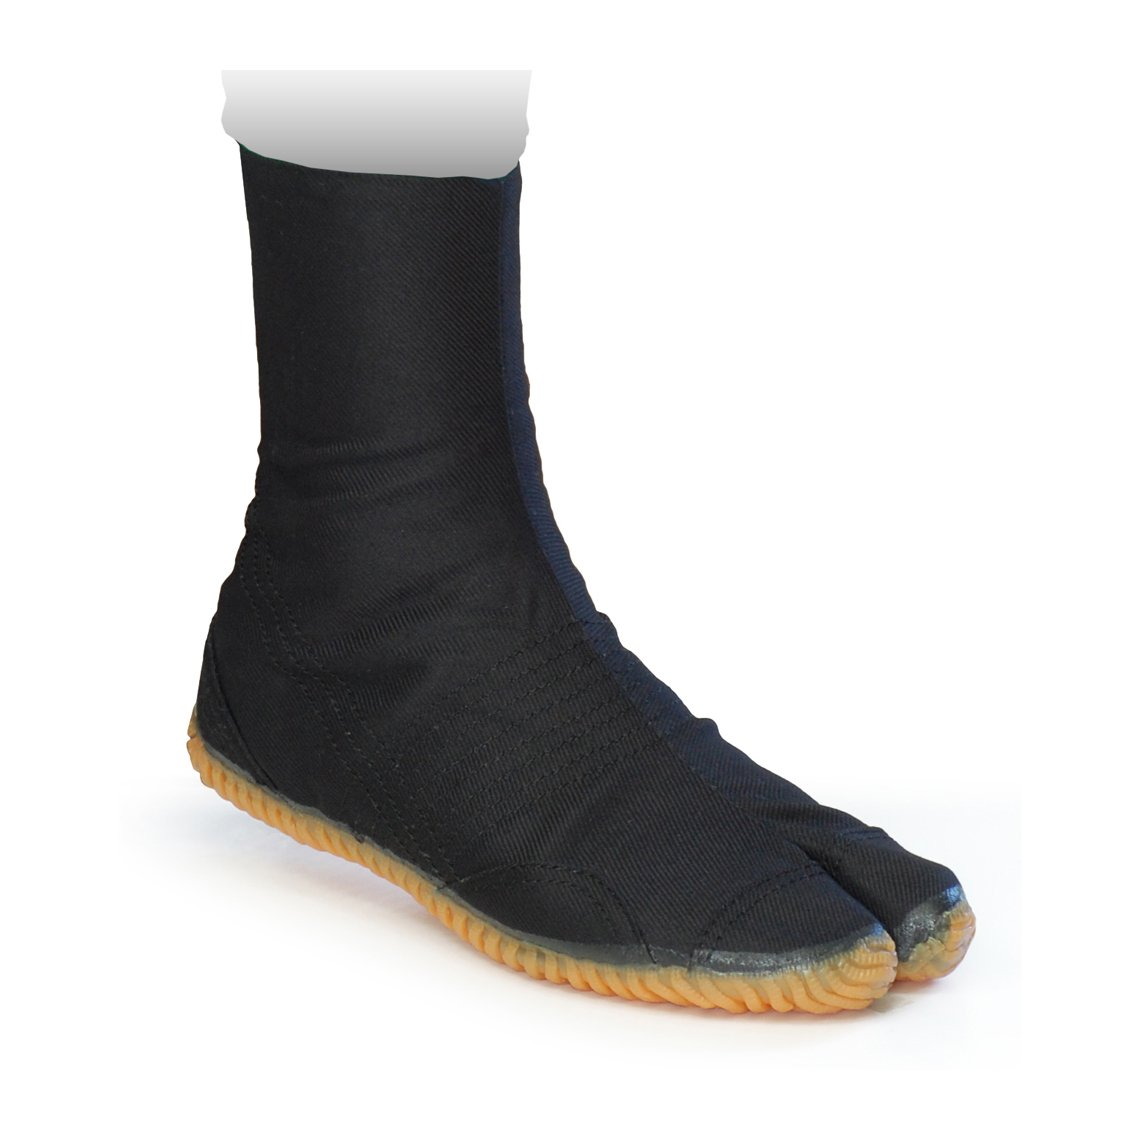 Amazon.com : Ninja Boots Tabi Shoes Matsuri Not Slip Sole ...